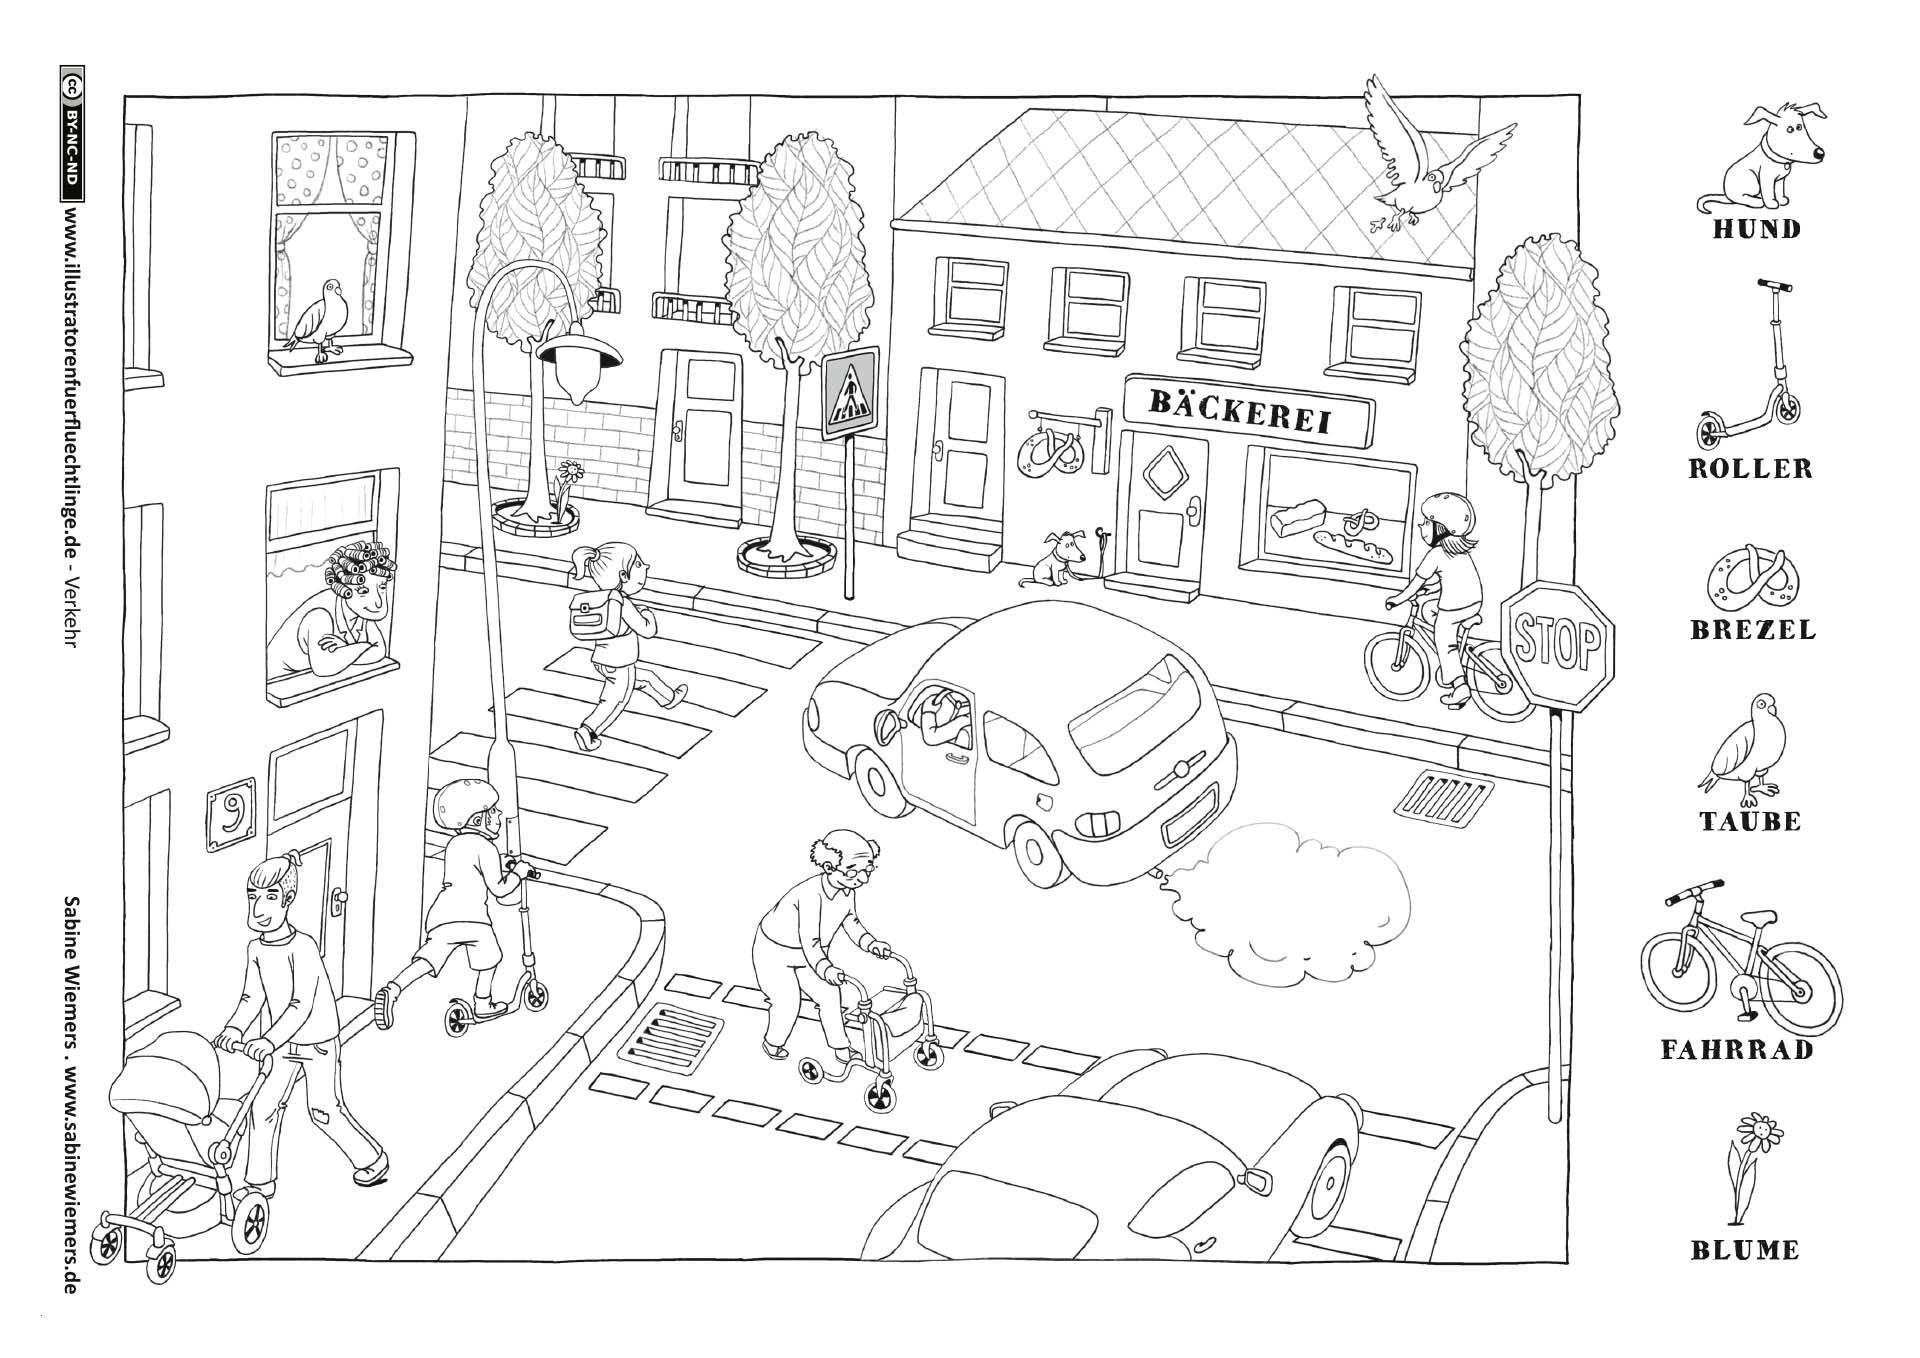 Kleeblatt Zum Ausmalen Inspirierend Kindergarten Bilder Zum Ausmalen Große 35 Verkehrserziehung Stock